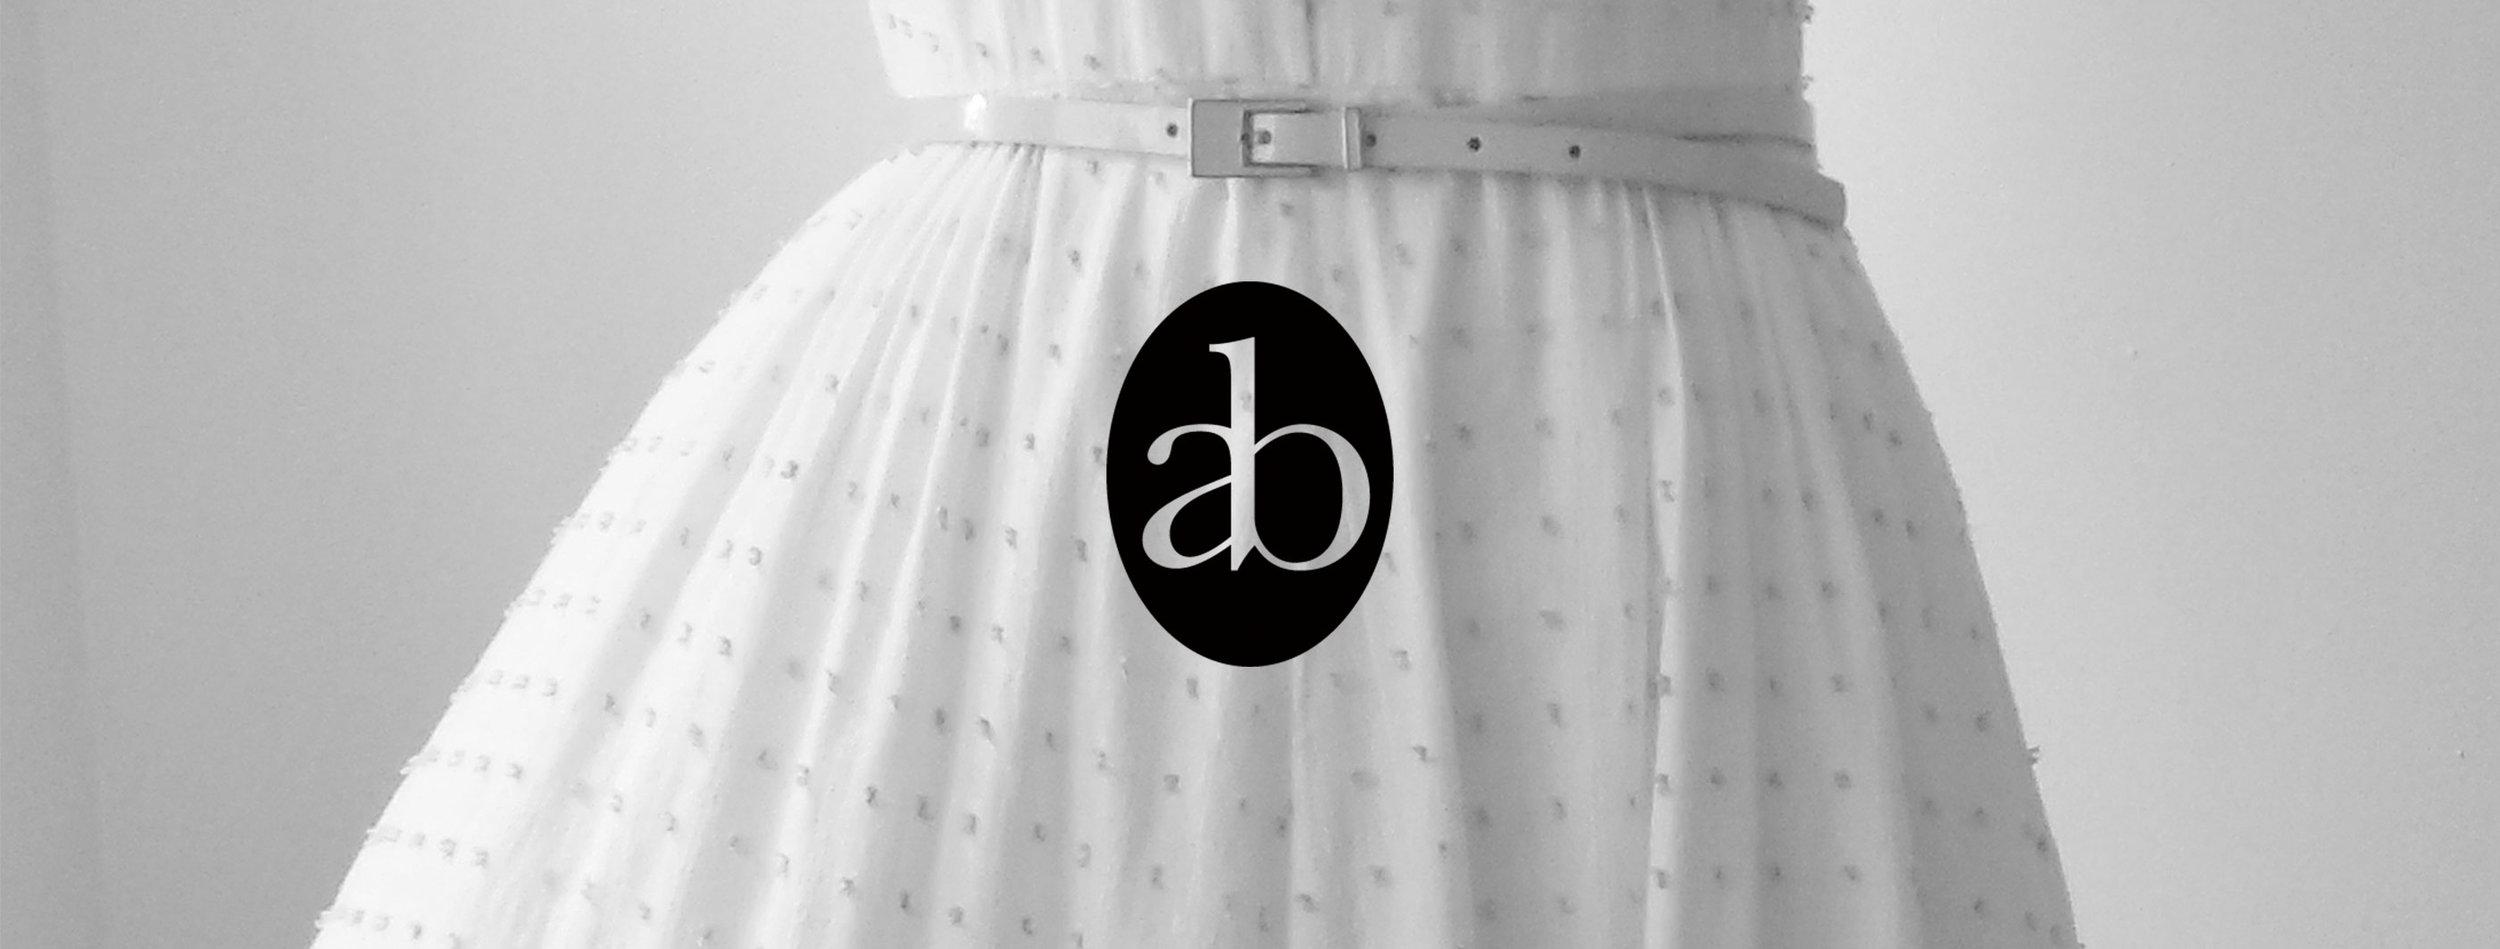 Studio-Eighty-Seven-Logo-Design-Anikka-Becker_Main-Image.jpg